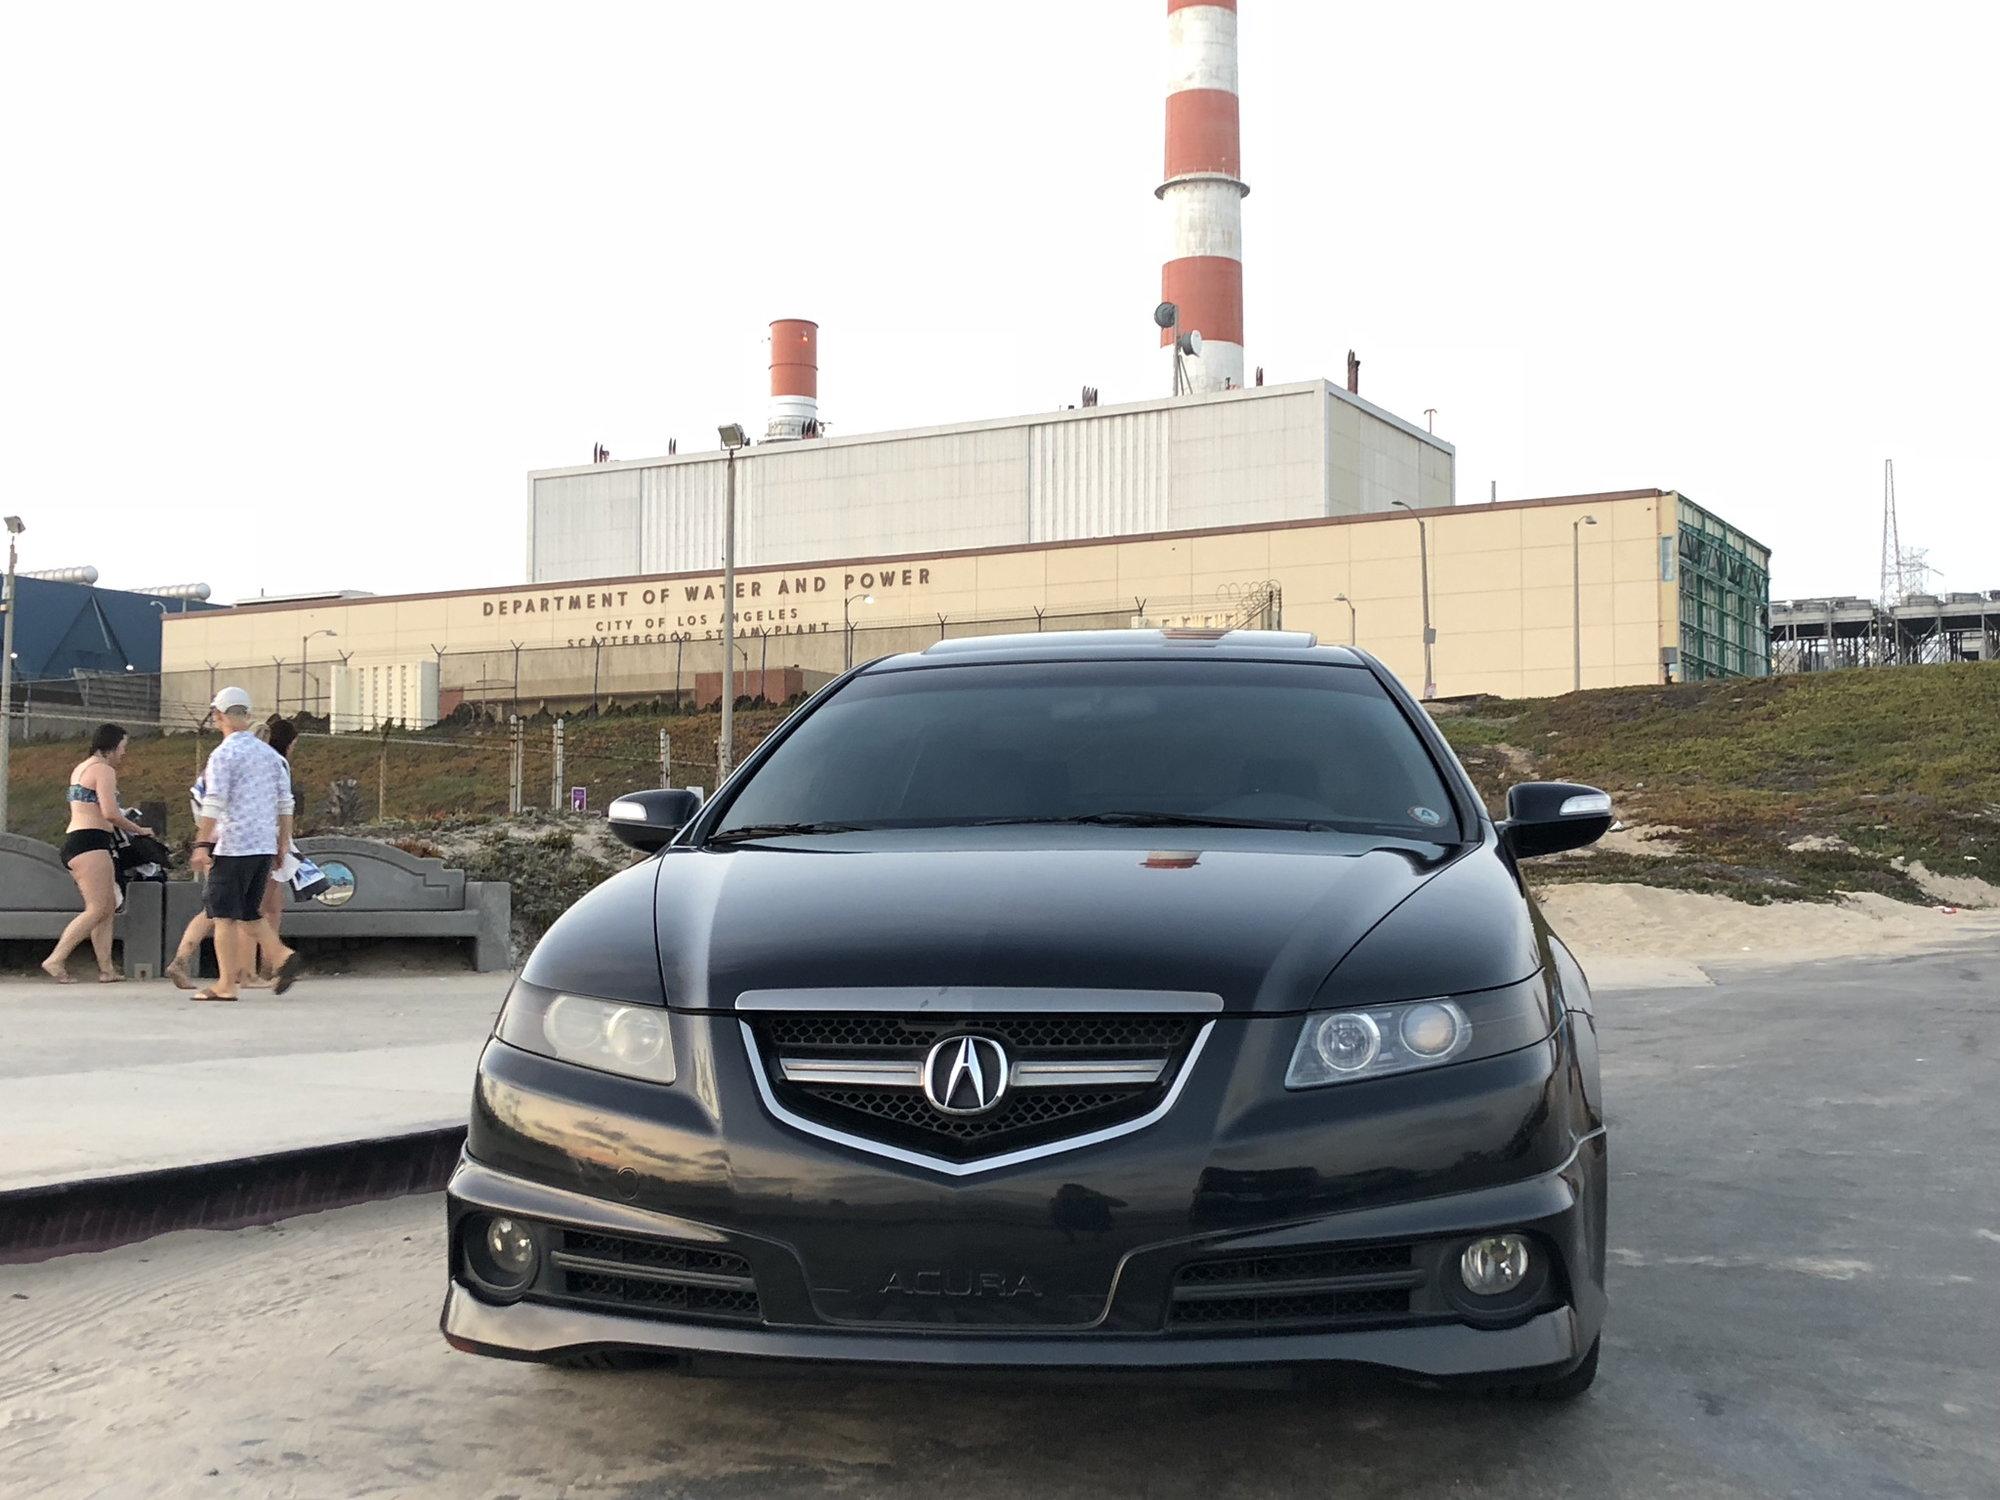 2007 Acura Tl Type S Navigation >> Fs 2007 Black Tl Type S 6spd W Navigation Acurazine Acura